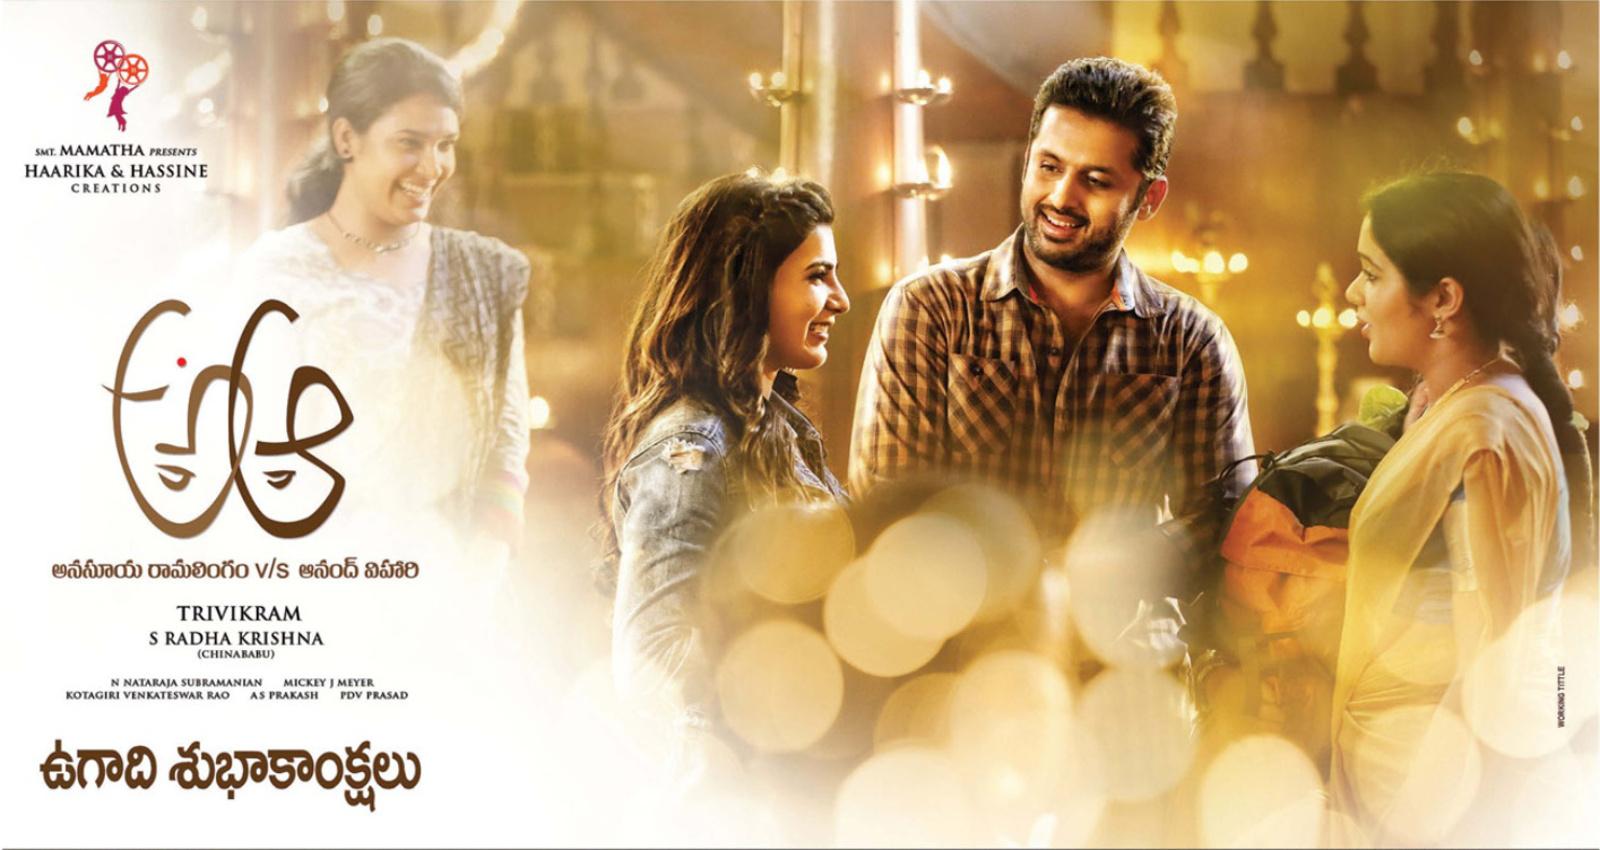 ... Aa (Anasuya Ramalingam vs Anand vihari) Movie Ugadi Special Poster